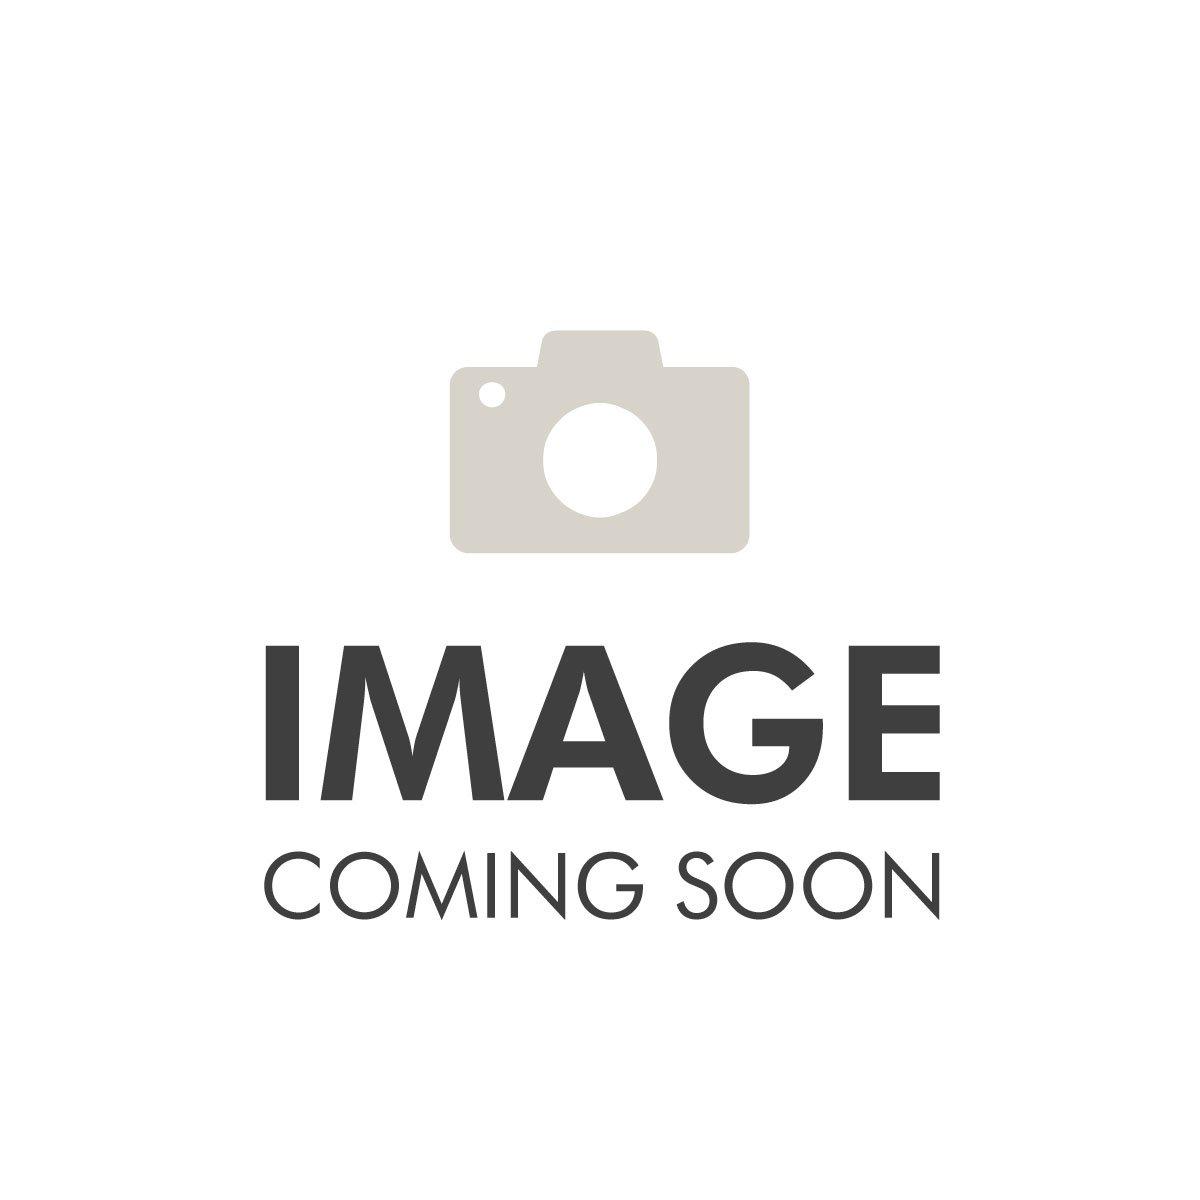 L'Oreal Loreal Men Tonique Vitalizing Shampoo 250ml